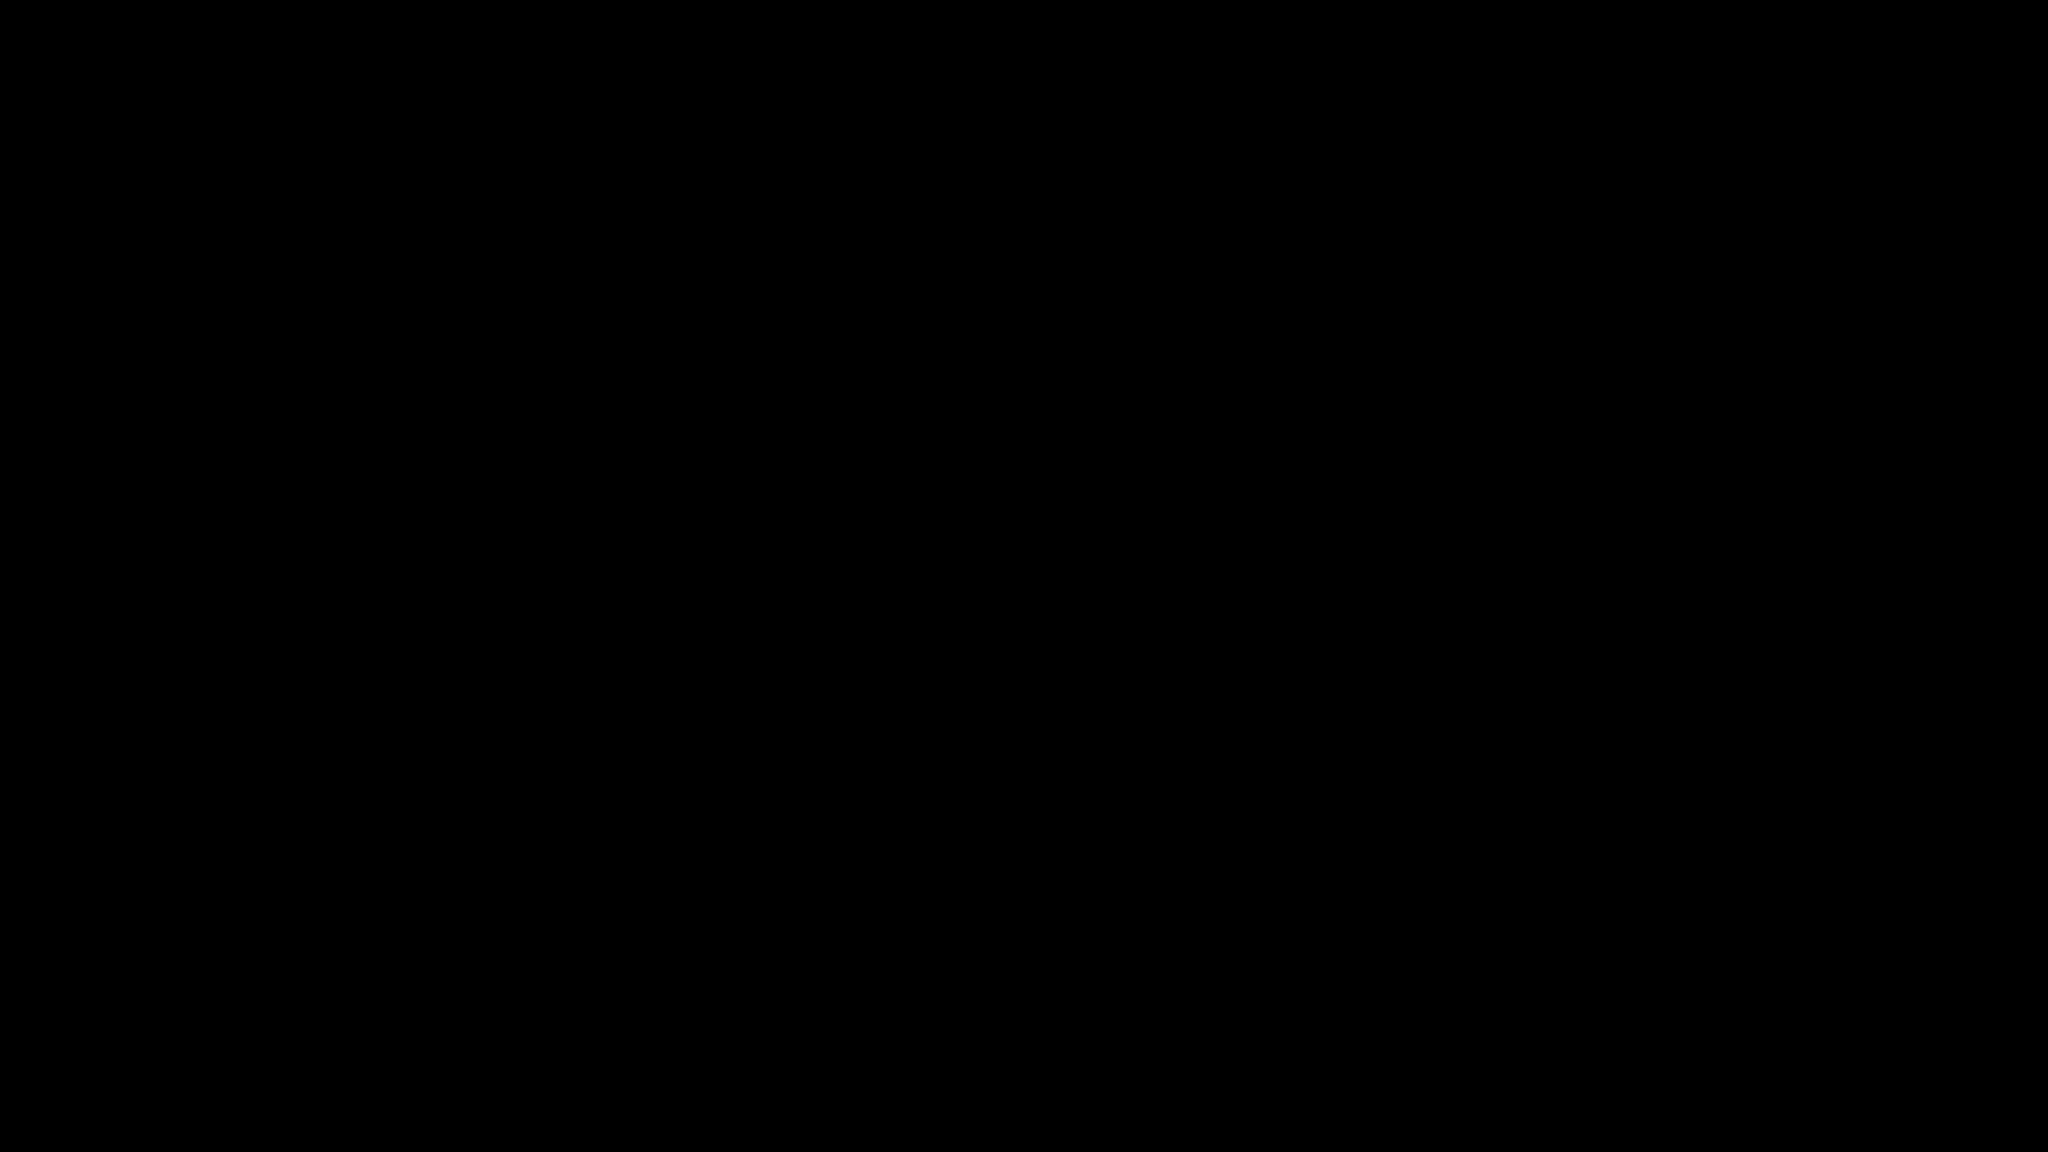 Preview wallpaper black, windows, vista, logo, glass 2048×1152